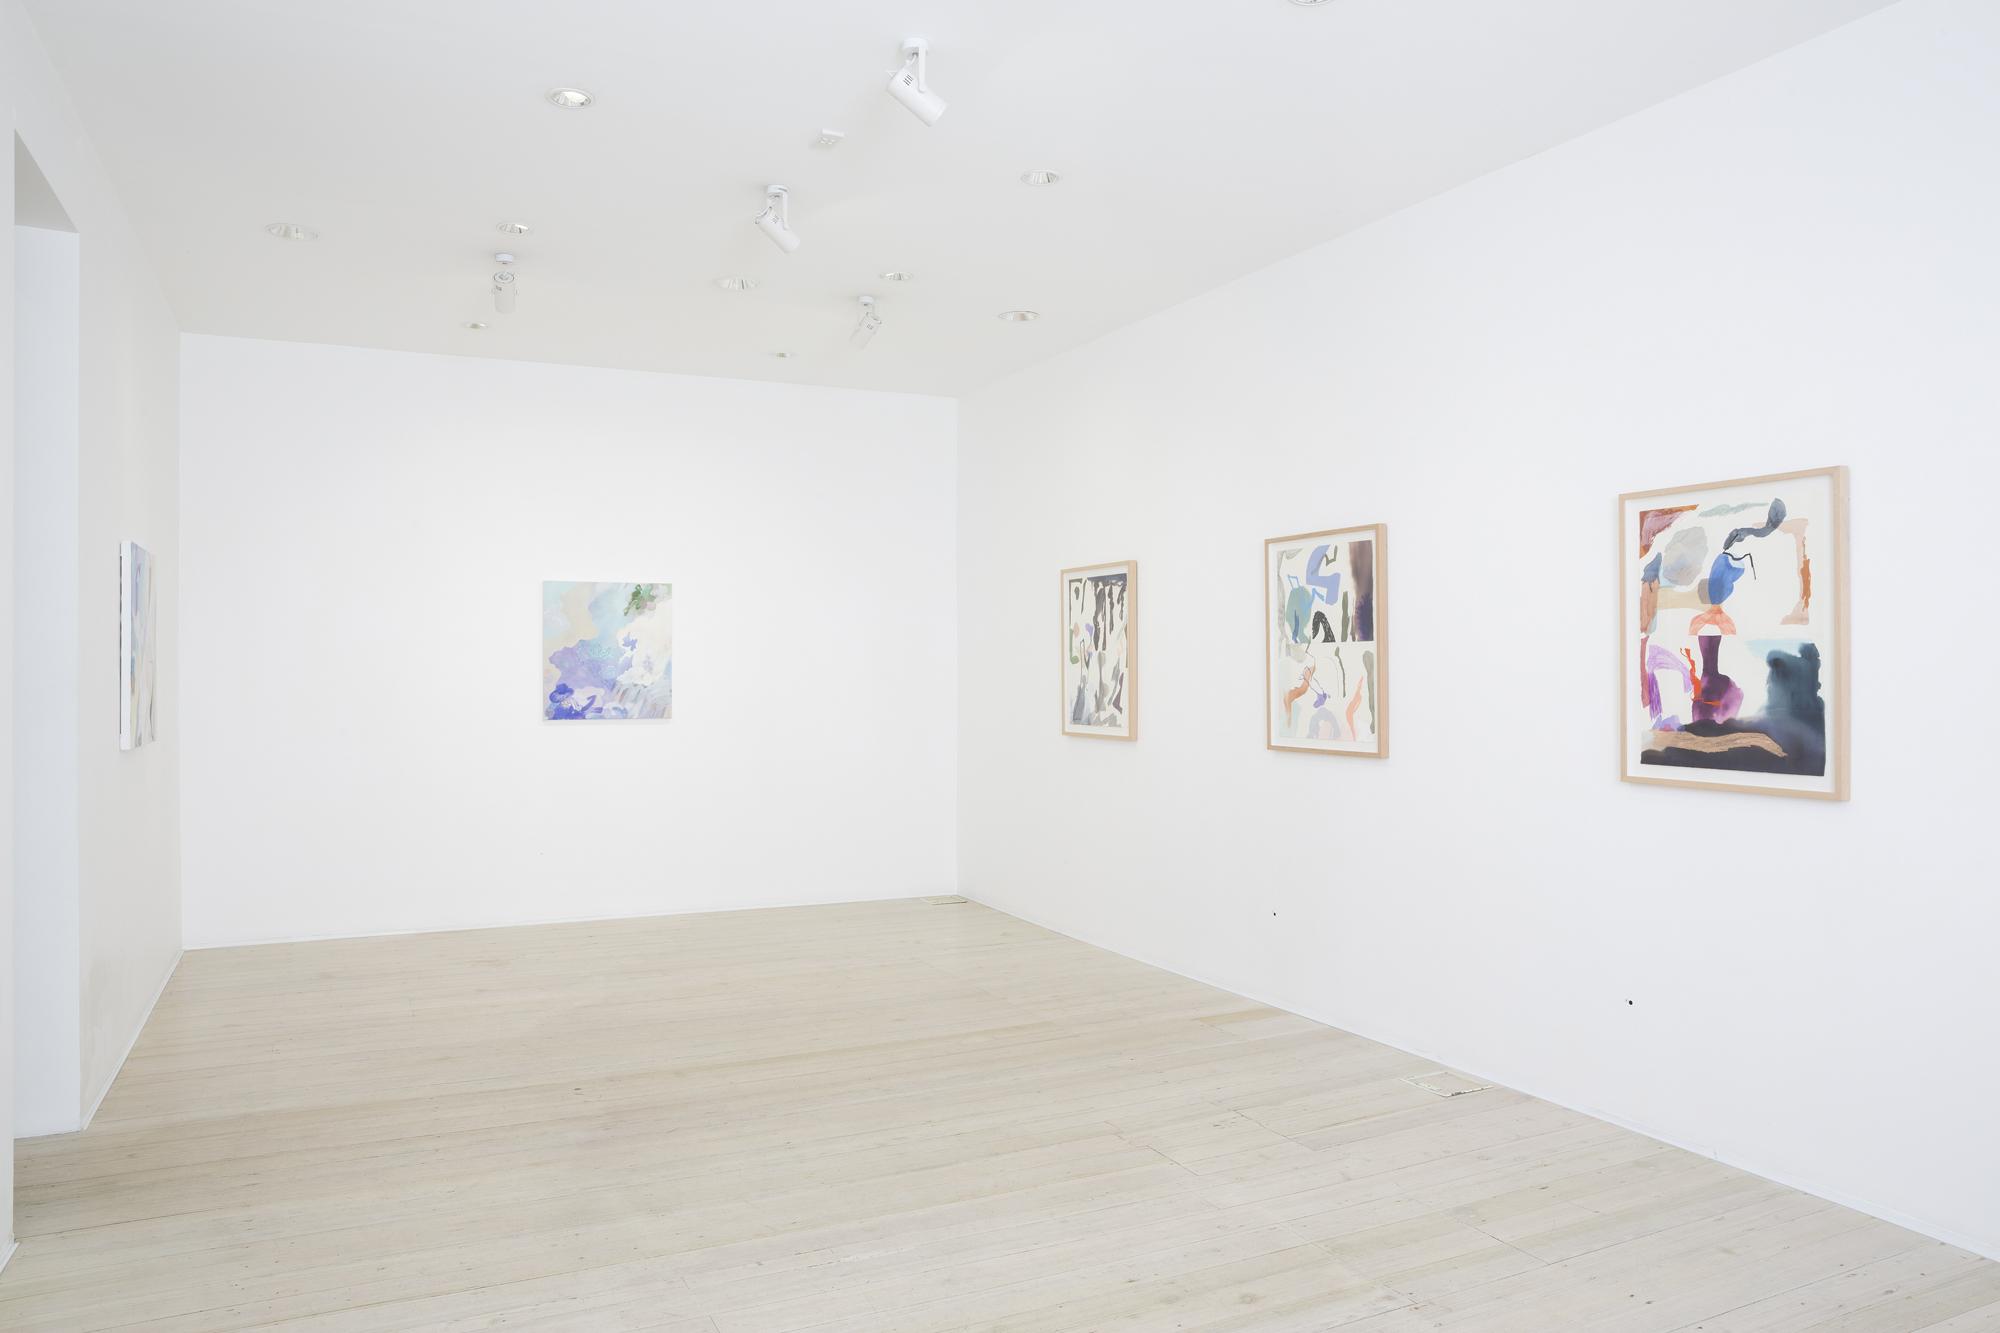 Tonee Messiah Exhibition, Gallery 9